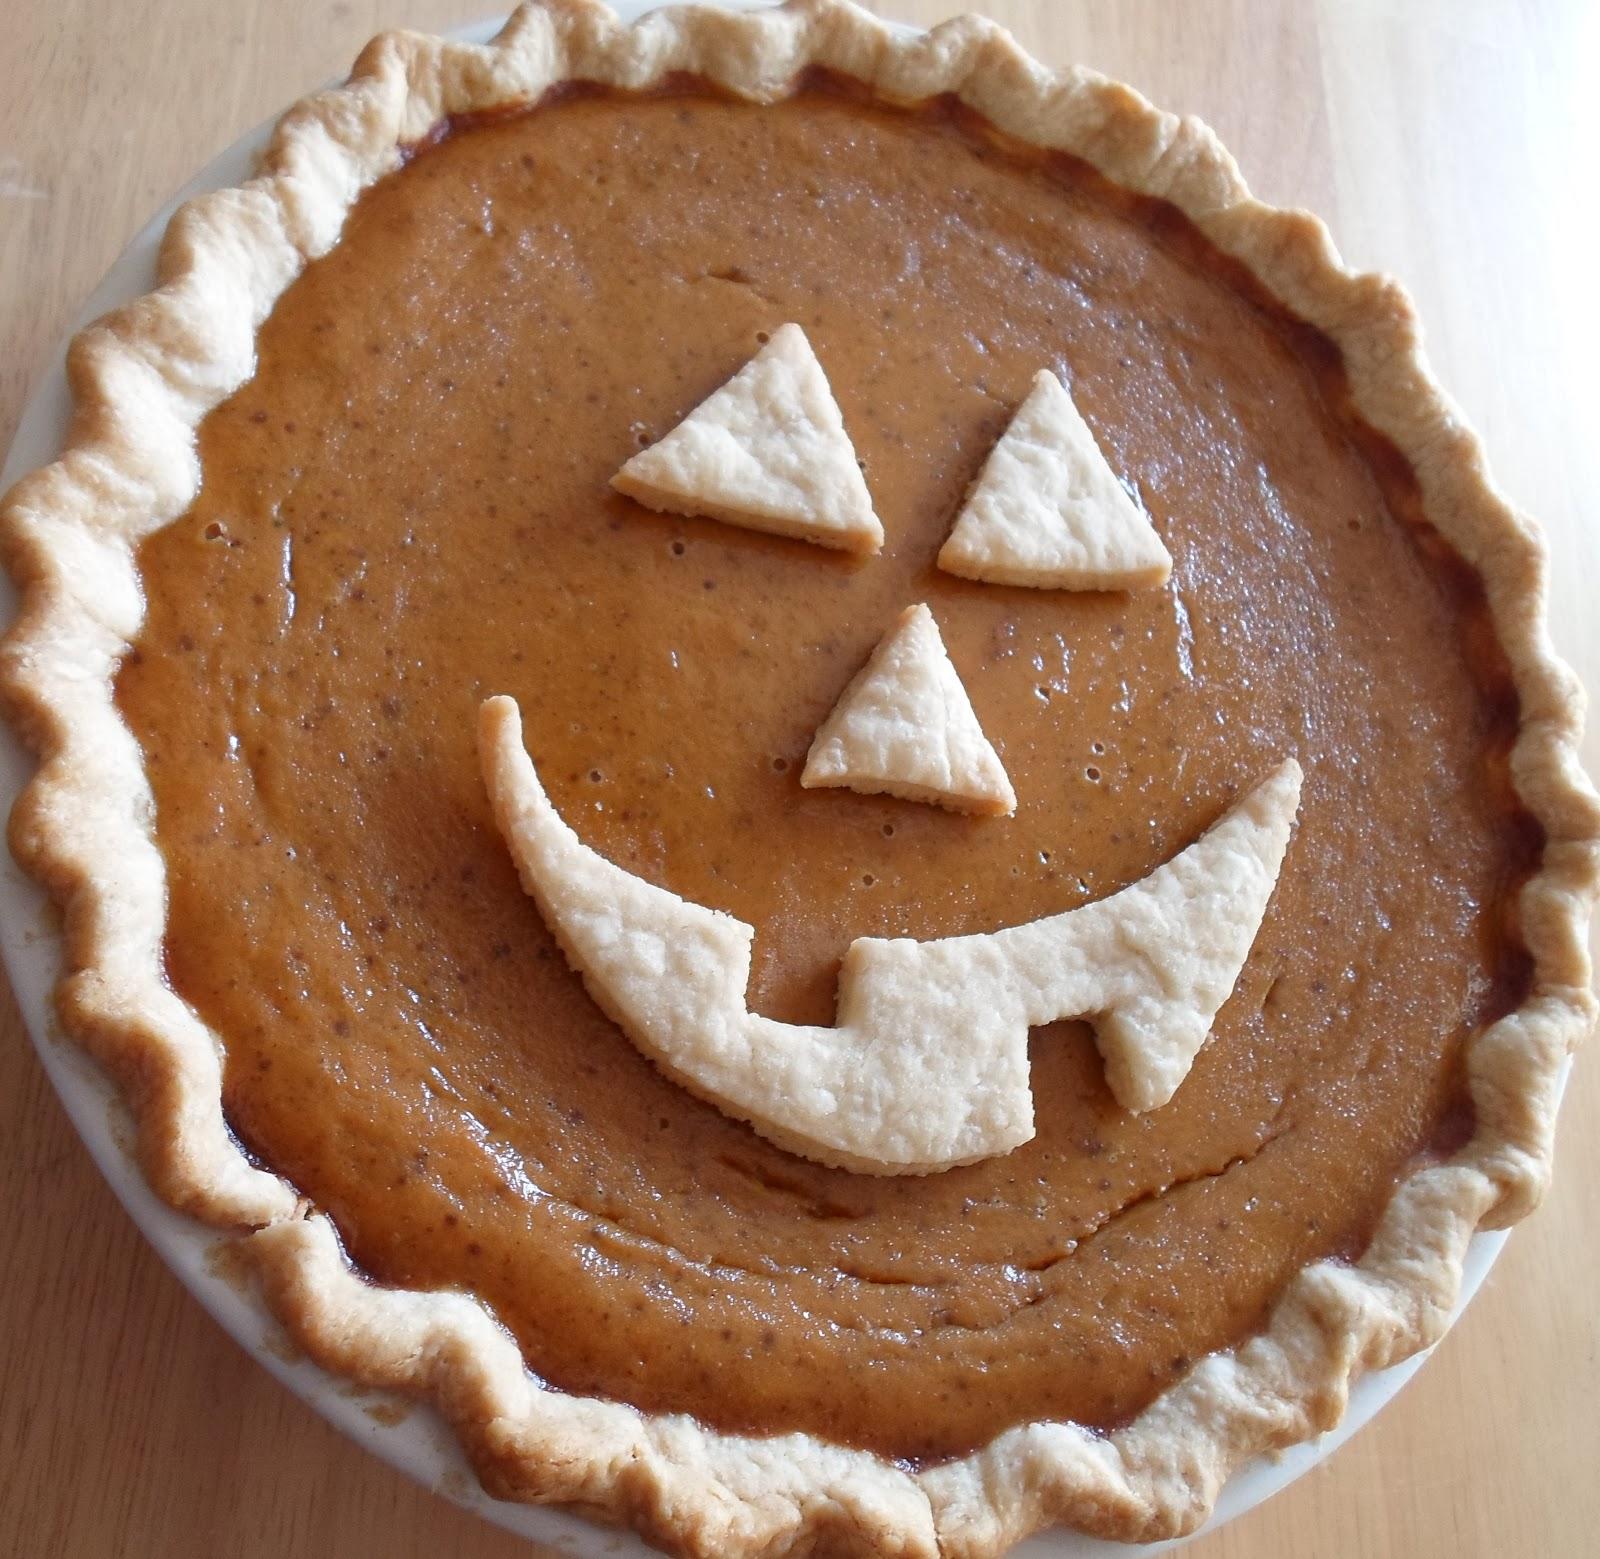 Happier Than A Pig In Mud: Jack-O-Lantern Pumpkin Pie